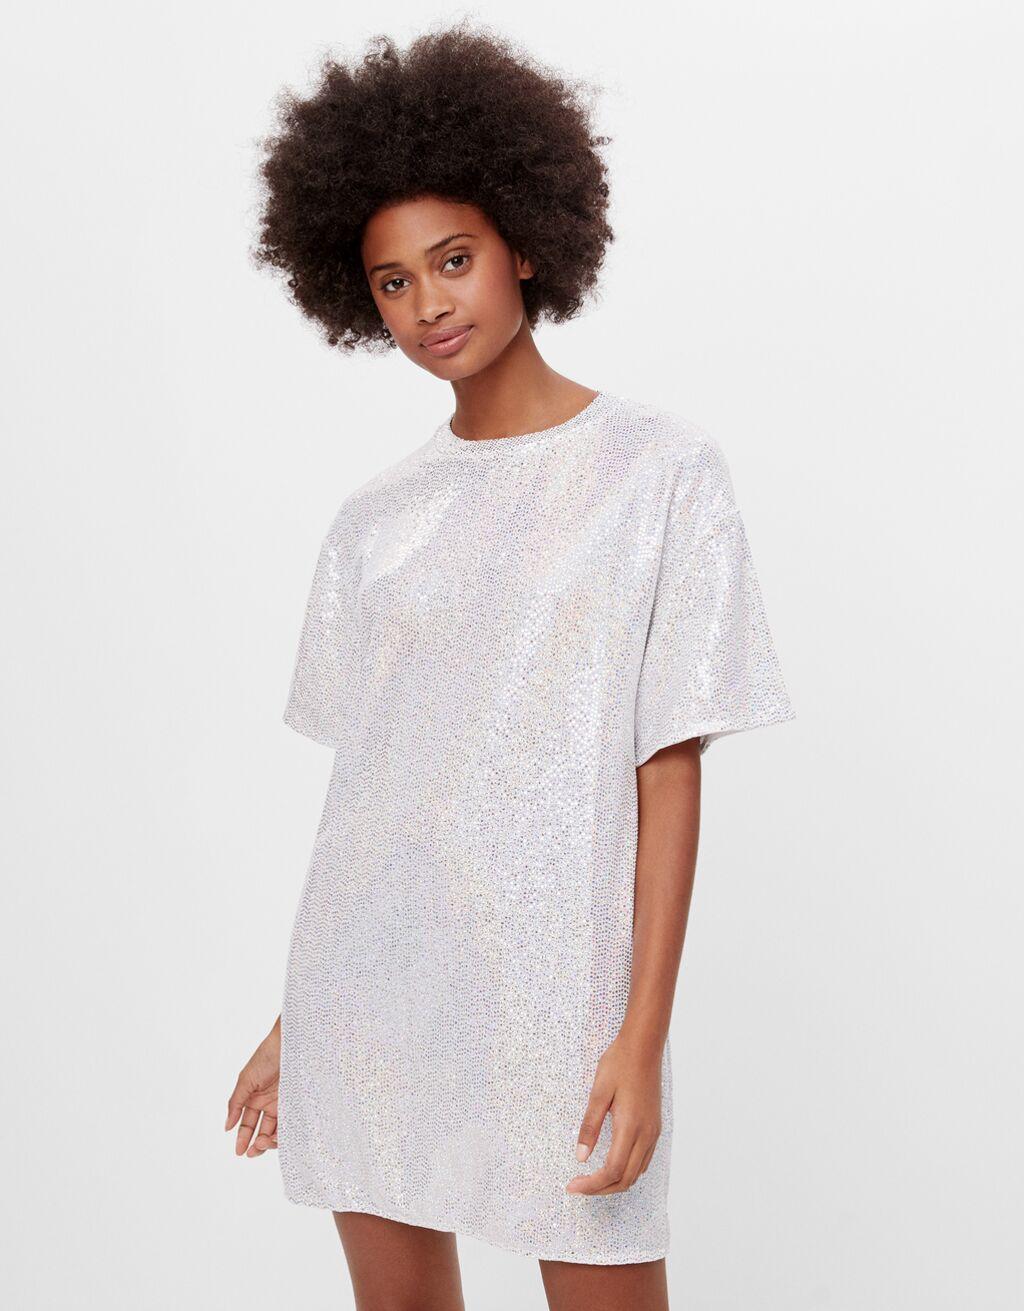 Sädelev T-särgi stiilis kleit